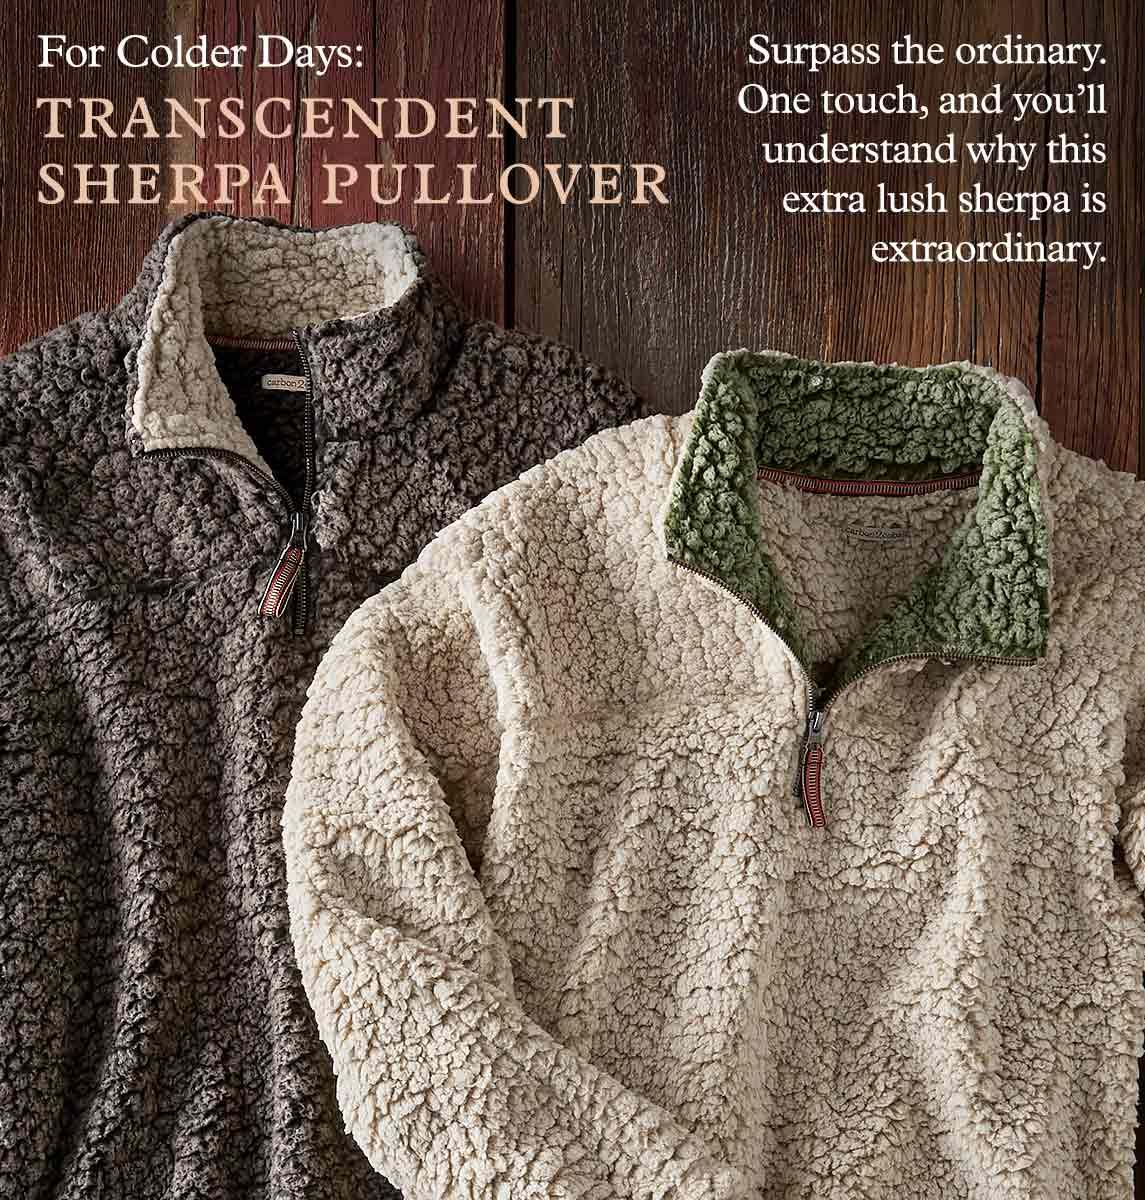 Transcendent Sherpa Pullover